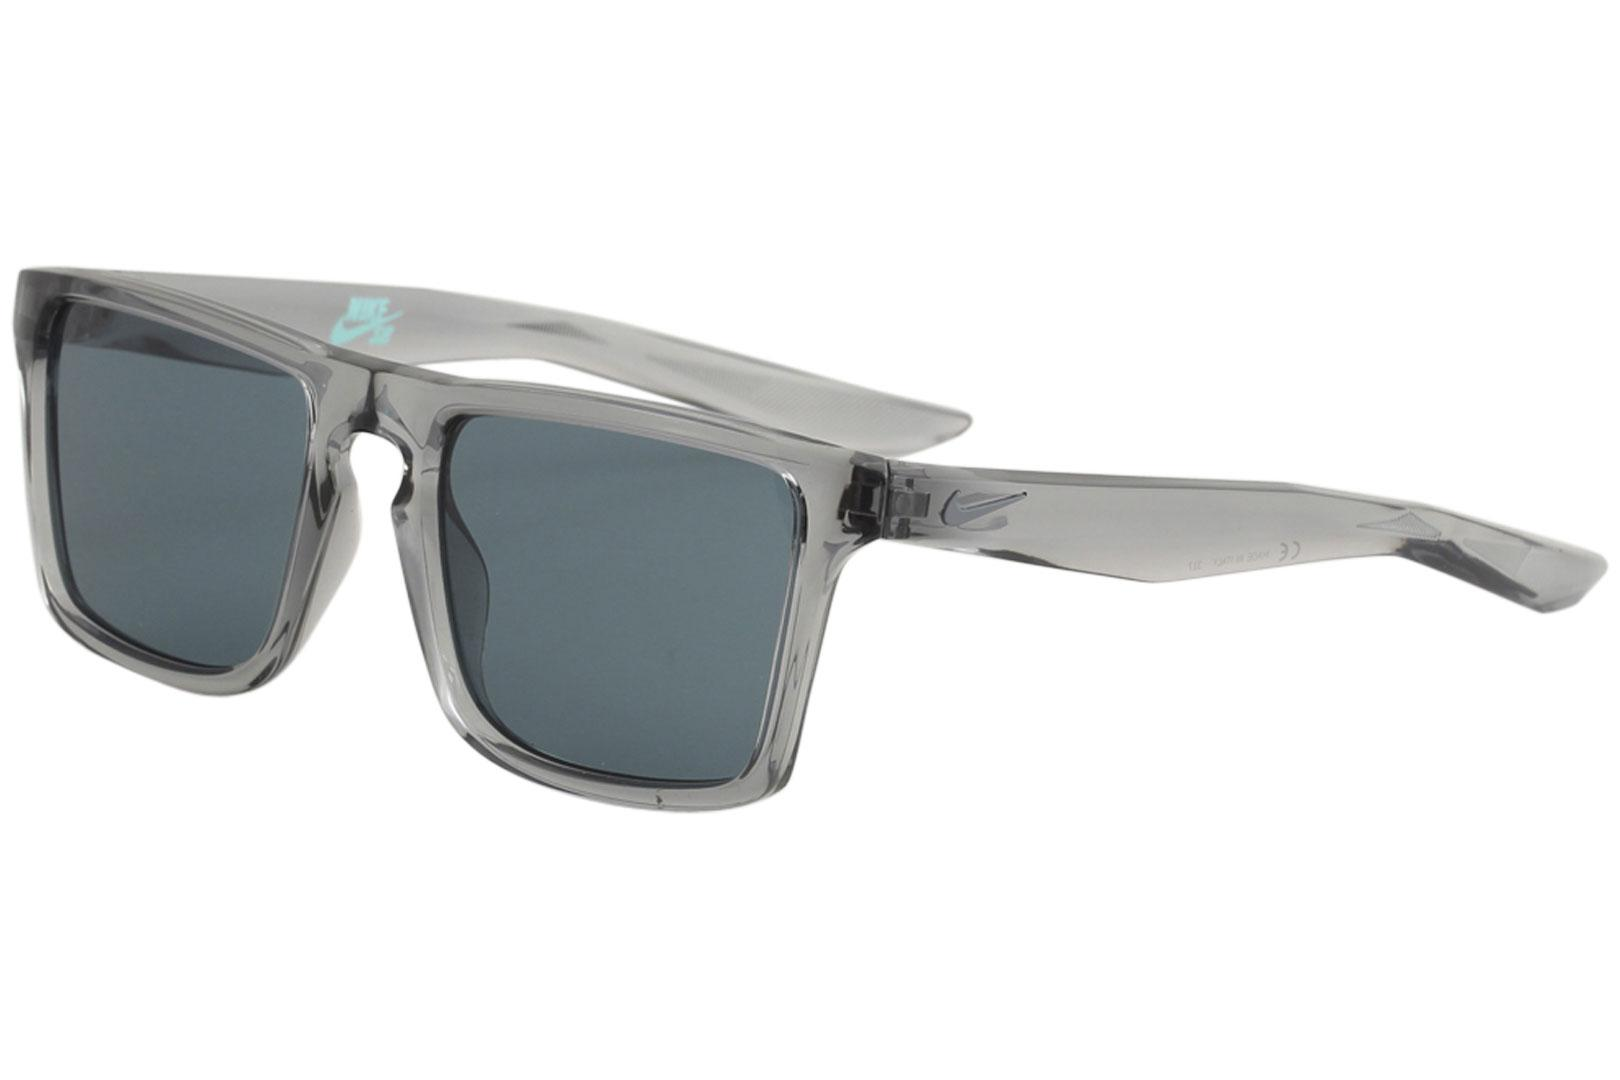 Image of Nike SB Men's Verge EV1059 EV/1059 Sport Square Sunglasses - Wolf Grey Cool Grey/Blue   004 - Lens 52 Bridge 19 Temple 145mm